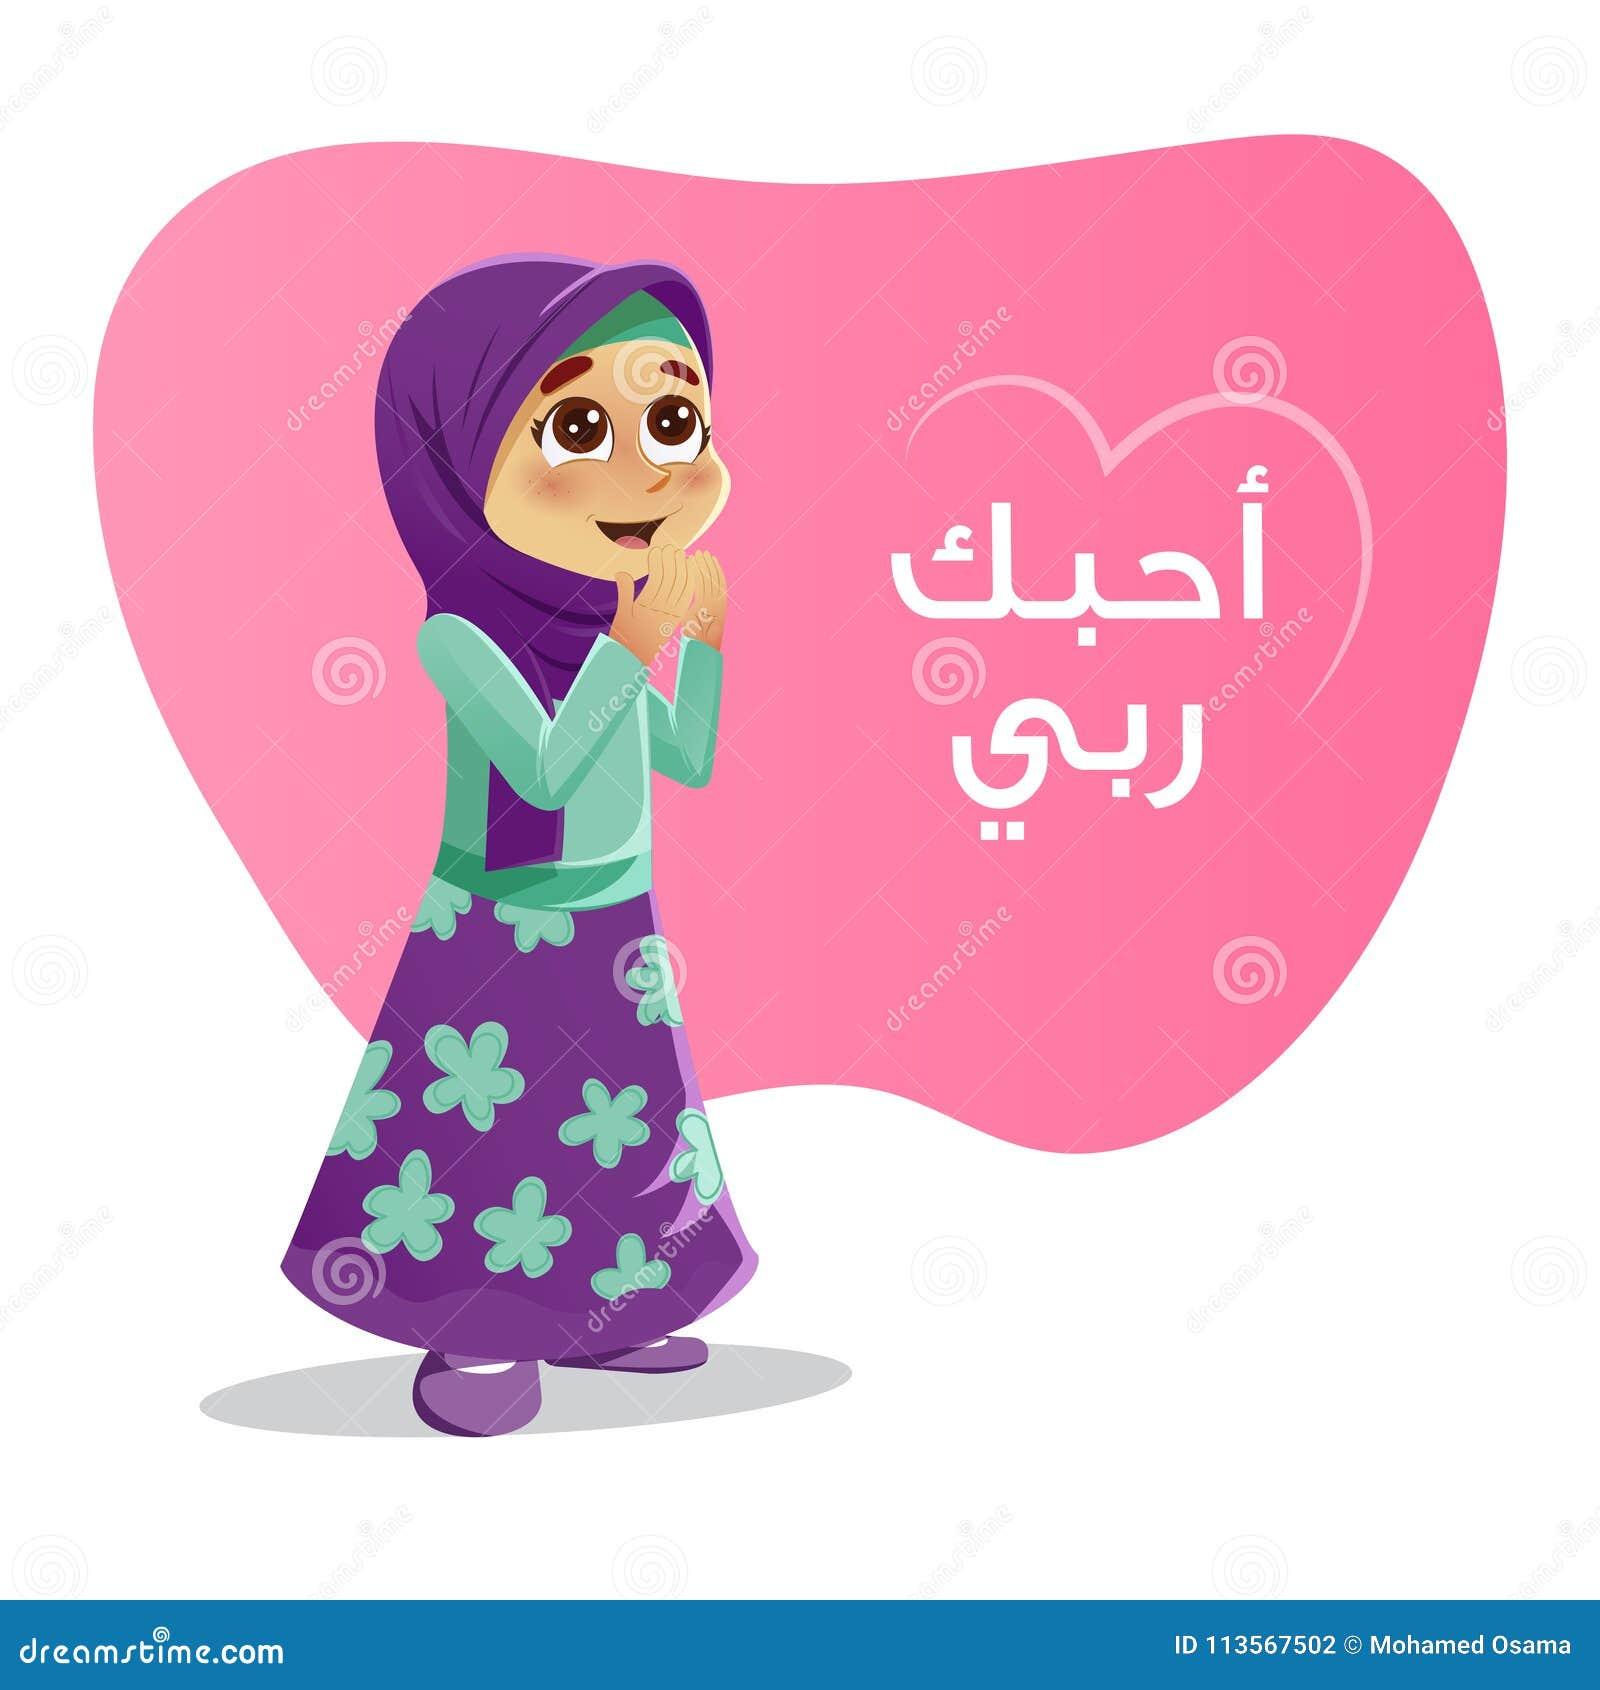 Girl Praying Love You Allah Stock Vector - Illustration of arabic